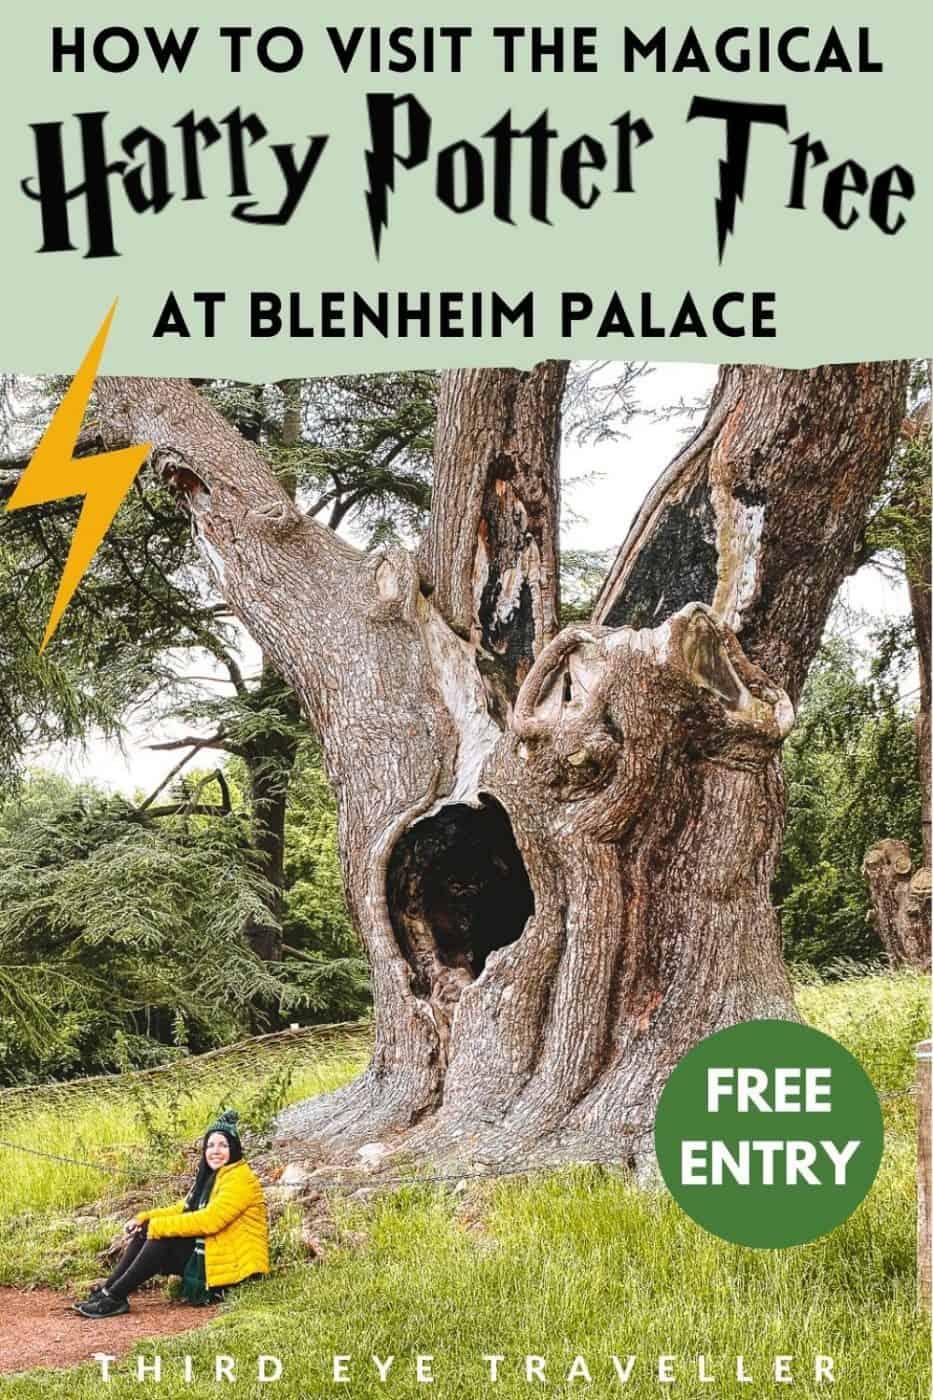 Harry Potter Tree Blenheim Palace